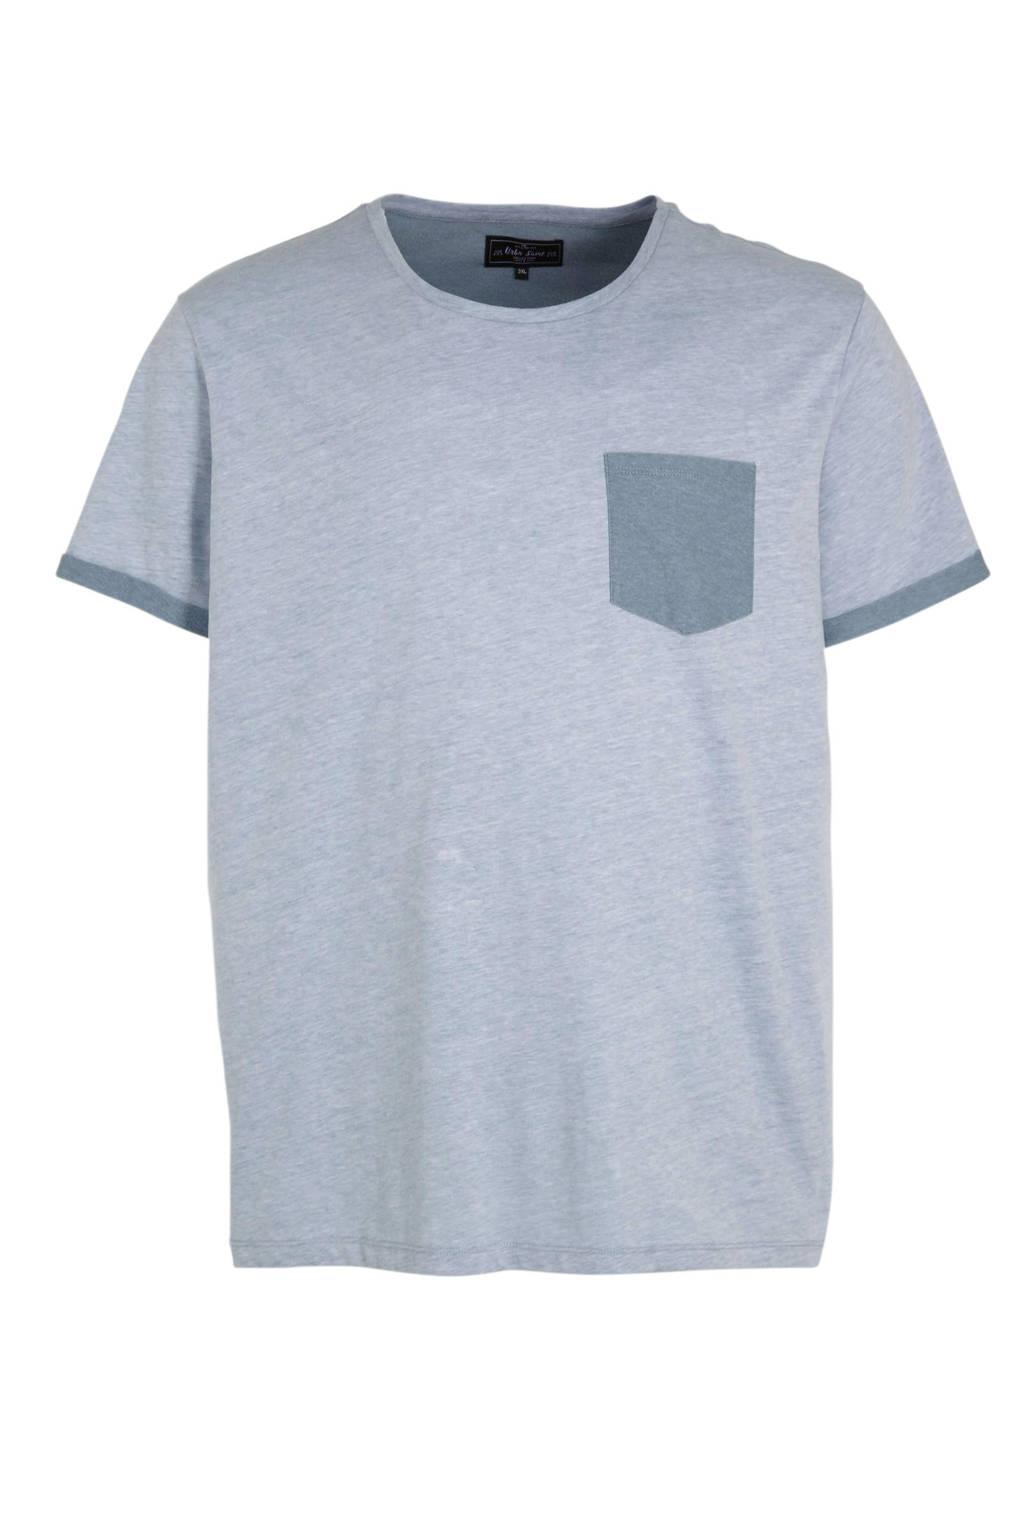 URBN SAINT T-shirt blauw, Blauw